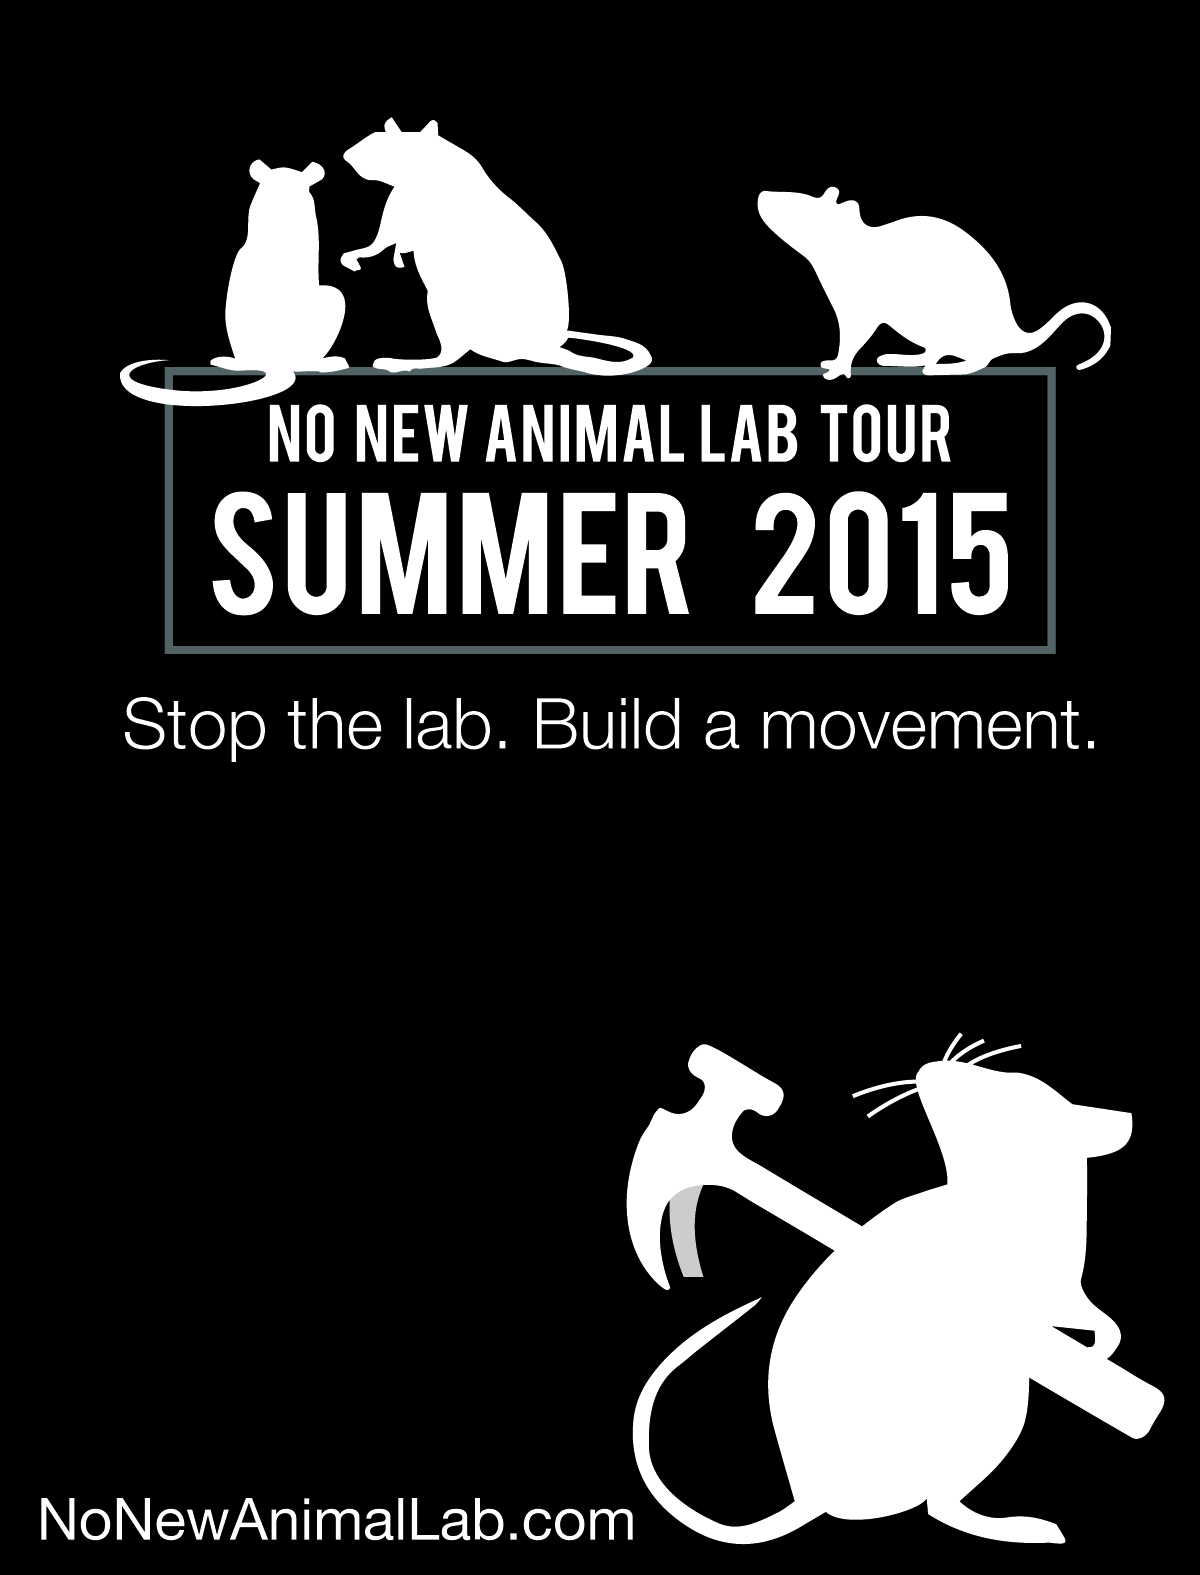 The no new animal lab tour has begun